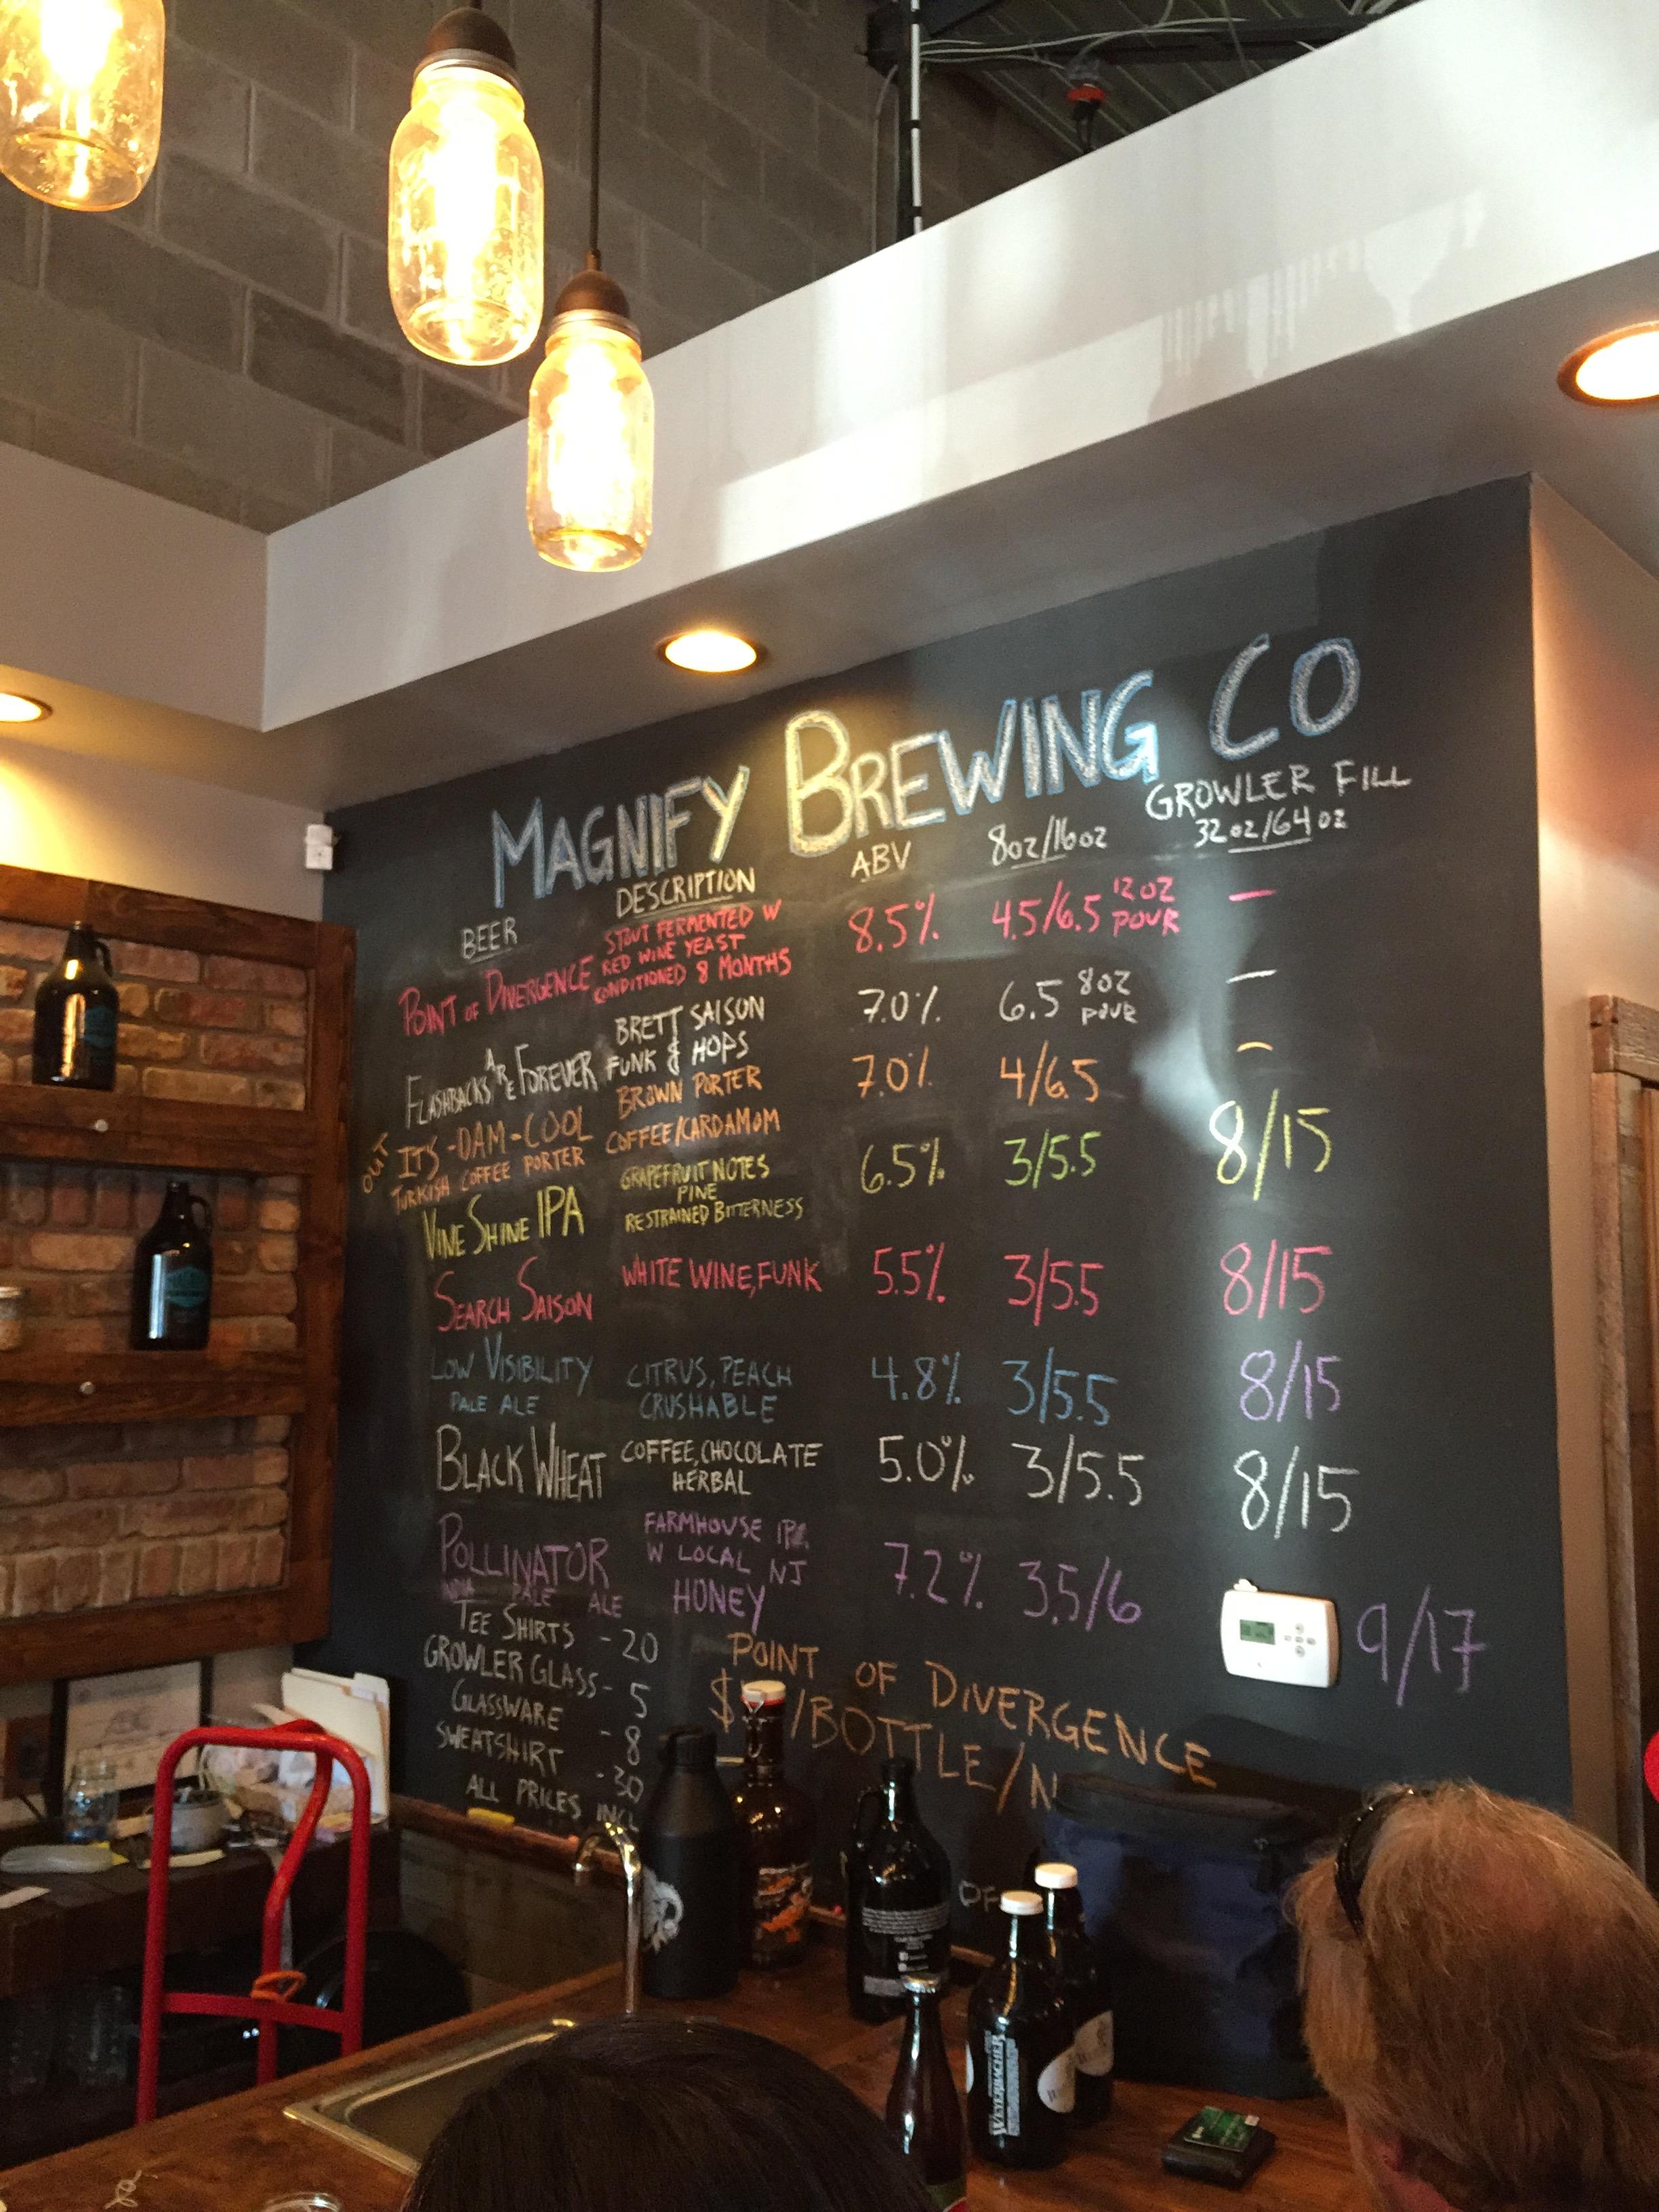 Magnify Brewing Co. Taplist